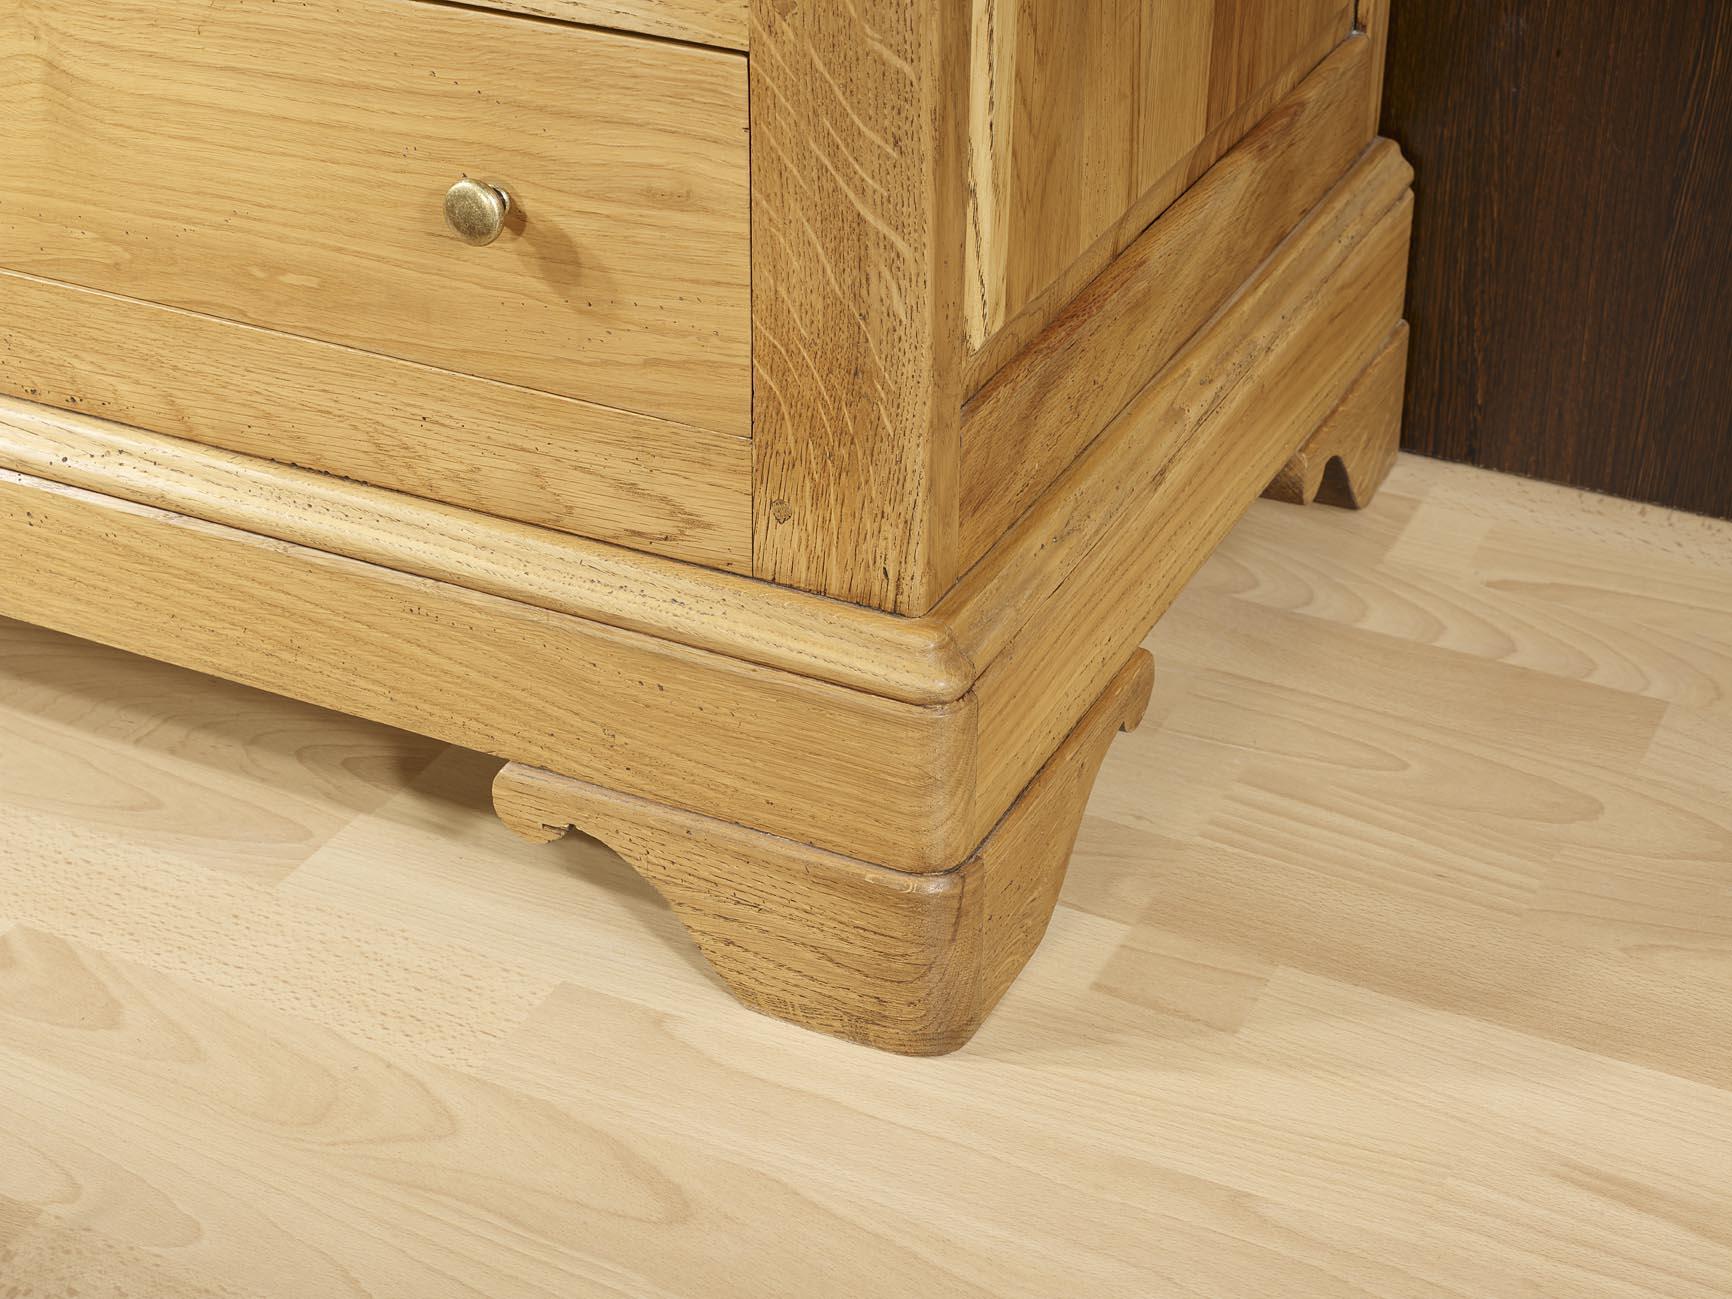 Mueble de tv 16 9 borga hecho en madera de roble macizo - Muebles de madera de roble ...